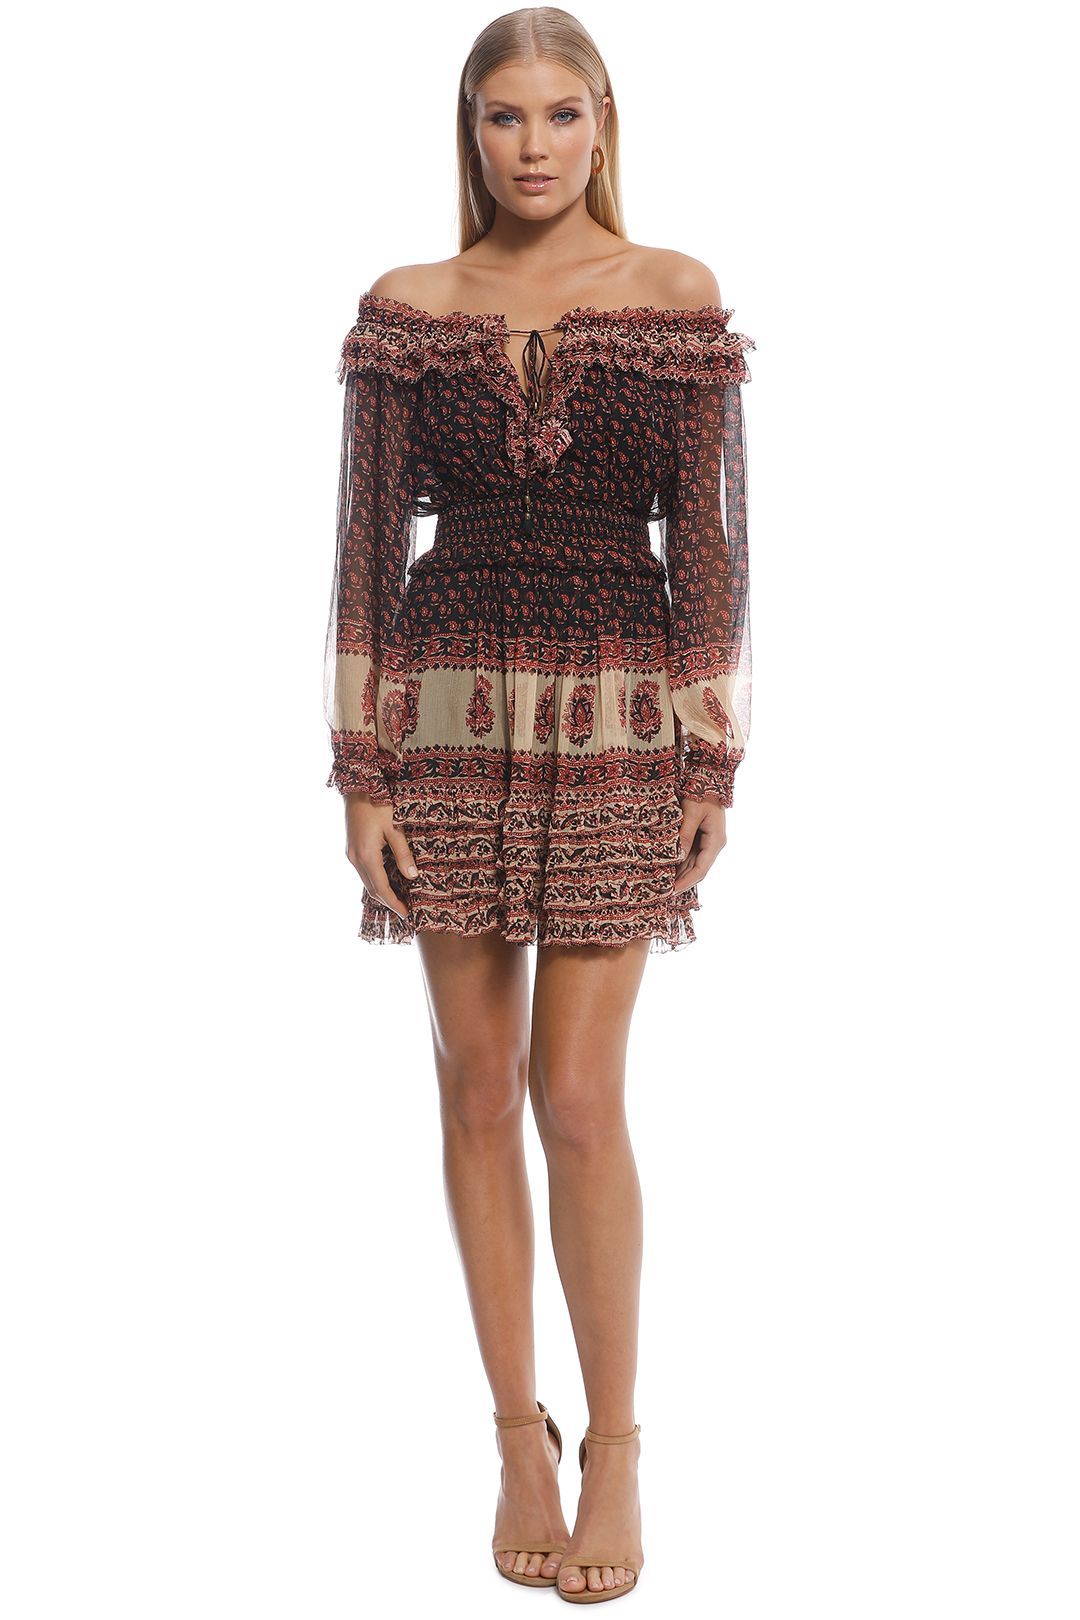 Zimmermann - Jaya Stamp Frill Dress - Maroon - Front